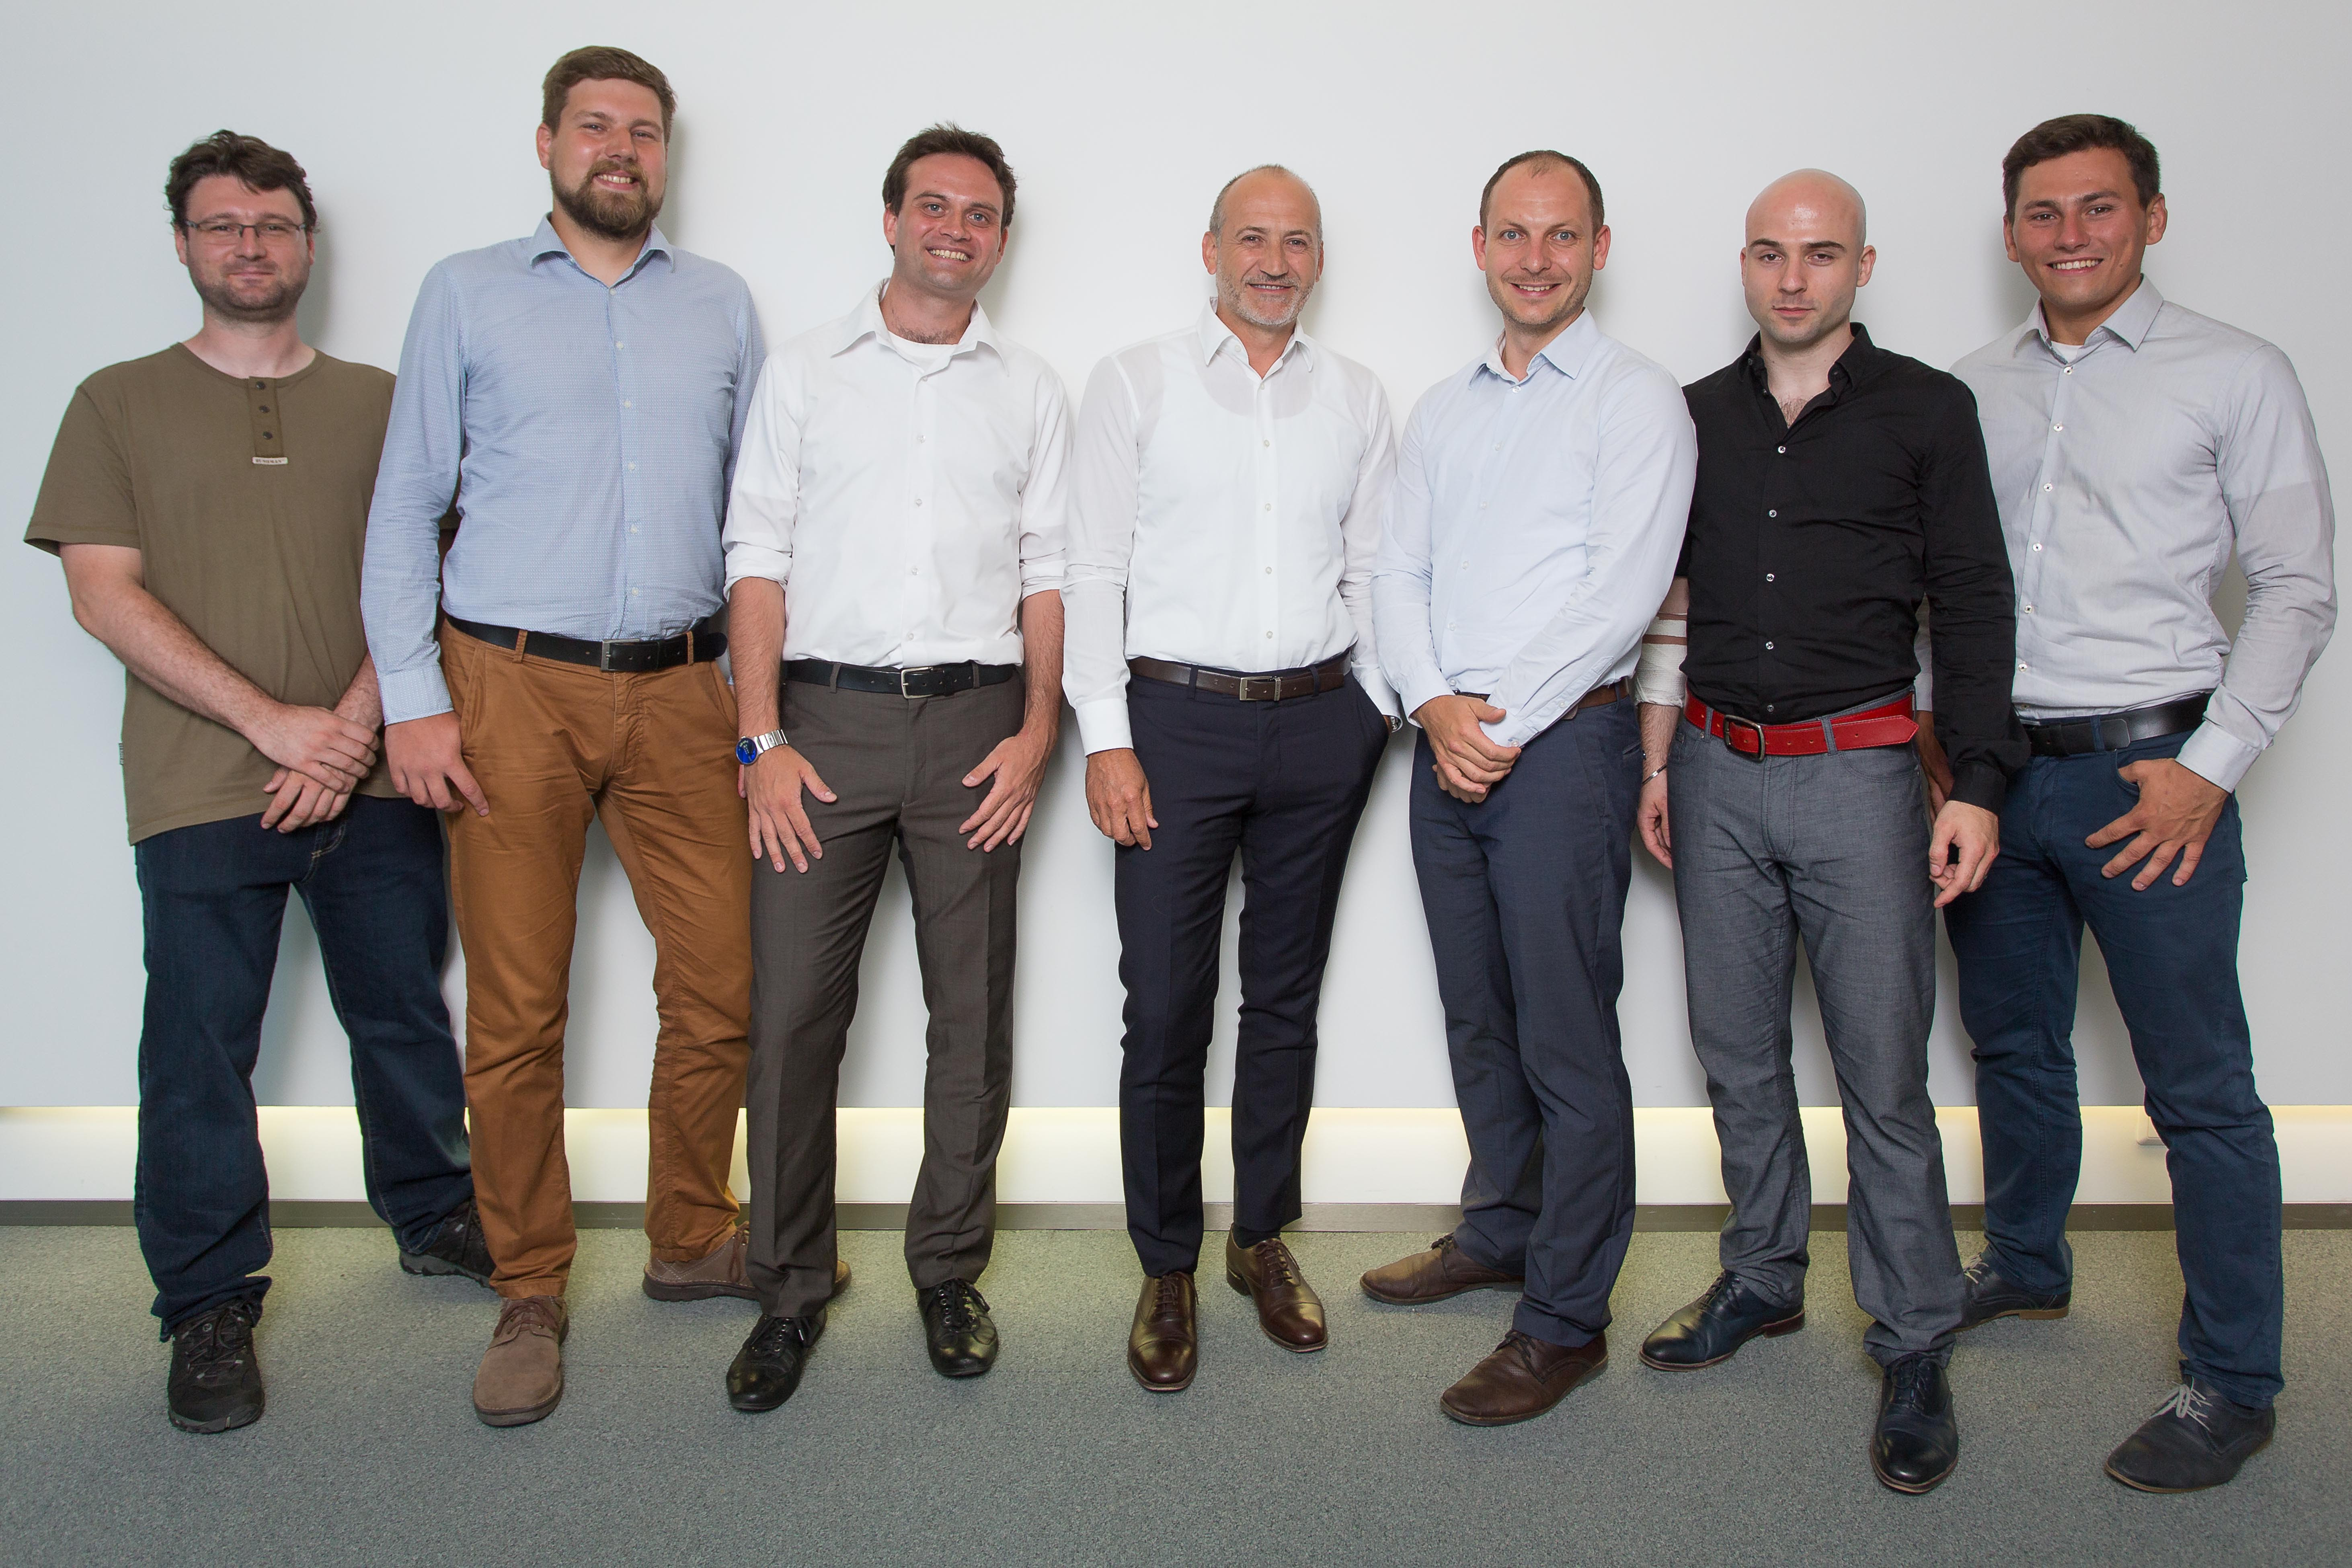 A1/Richard Tanzer (li.n.re.): Jan Mikulasek, Robert Sefr, Richard Malovic (CEO Whalebone), Alejandro Plater (CEO Telekom Austria), Petr Soukenik, Michal Karm, Petr Kopriva.